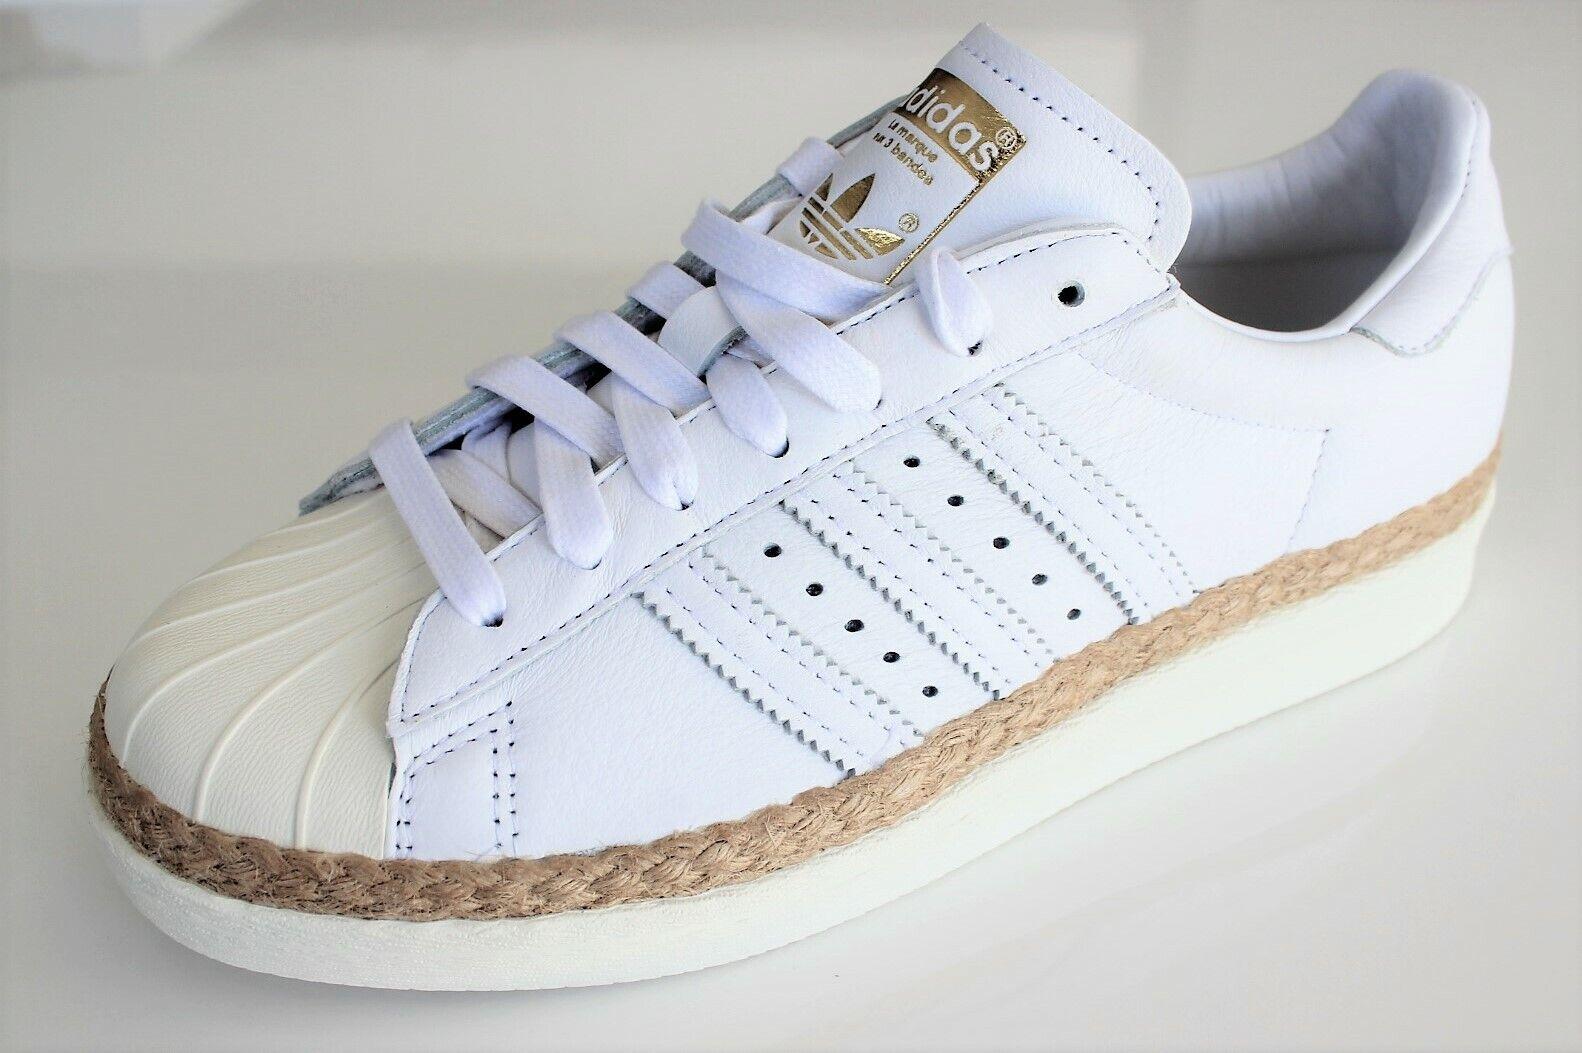 Adidas Originals Superstar 80s New Bold W, Gr. 36, weiß Creme, NEU & OVP Schuhe